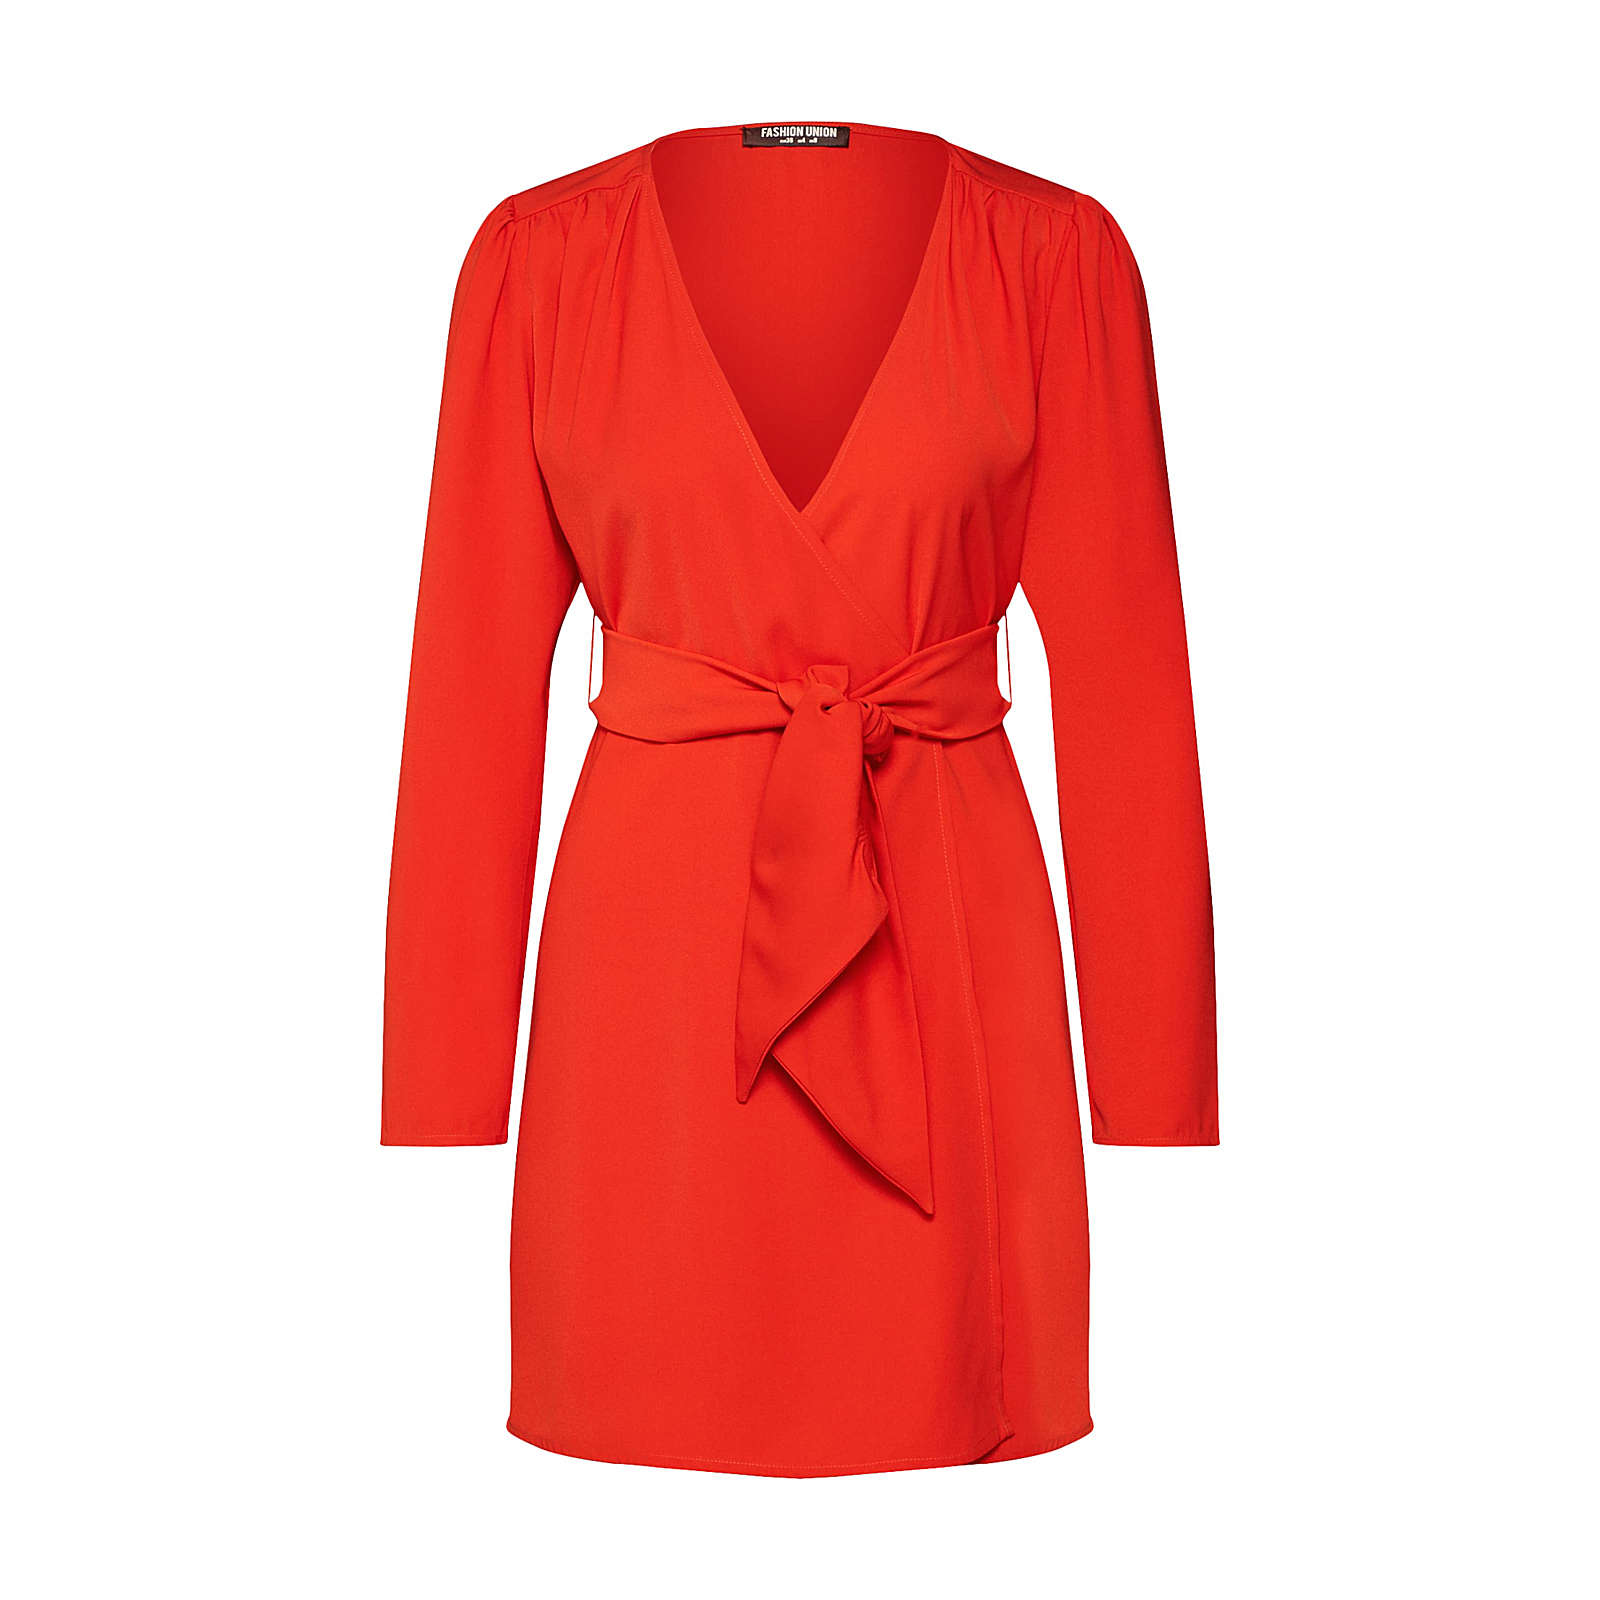 Fashion Union Blusenkleid Alina Blusenkleider orange Damen Gr. 40